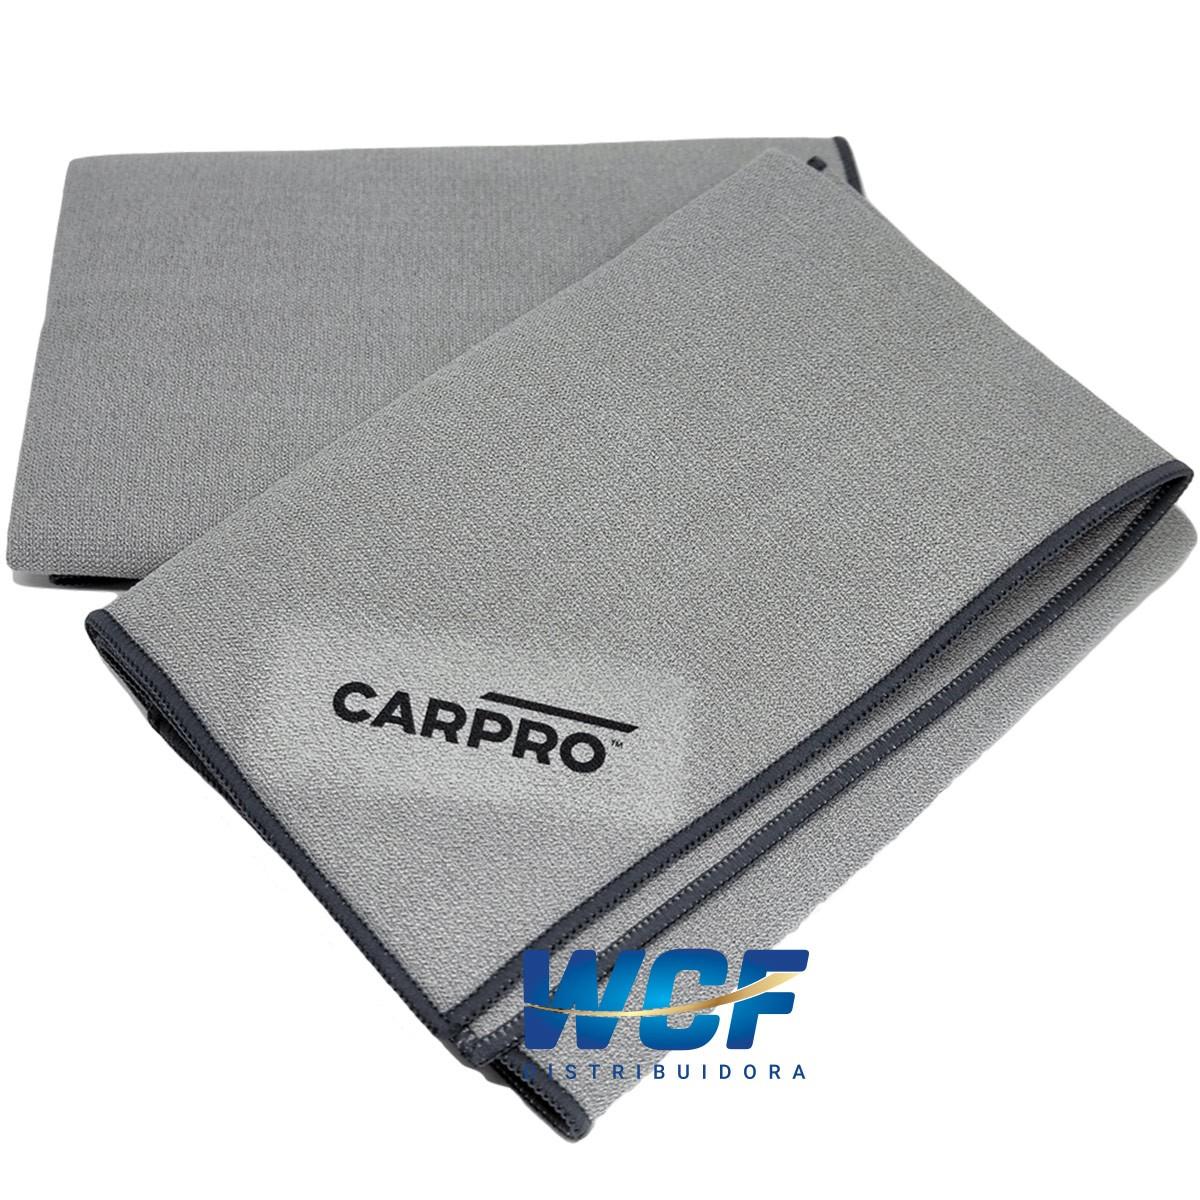 CARPRO GLASS FIBER 40 X 40 TOALHA LIMPEZA VIDROS